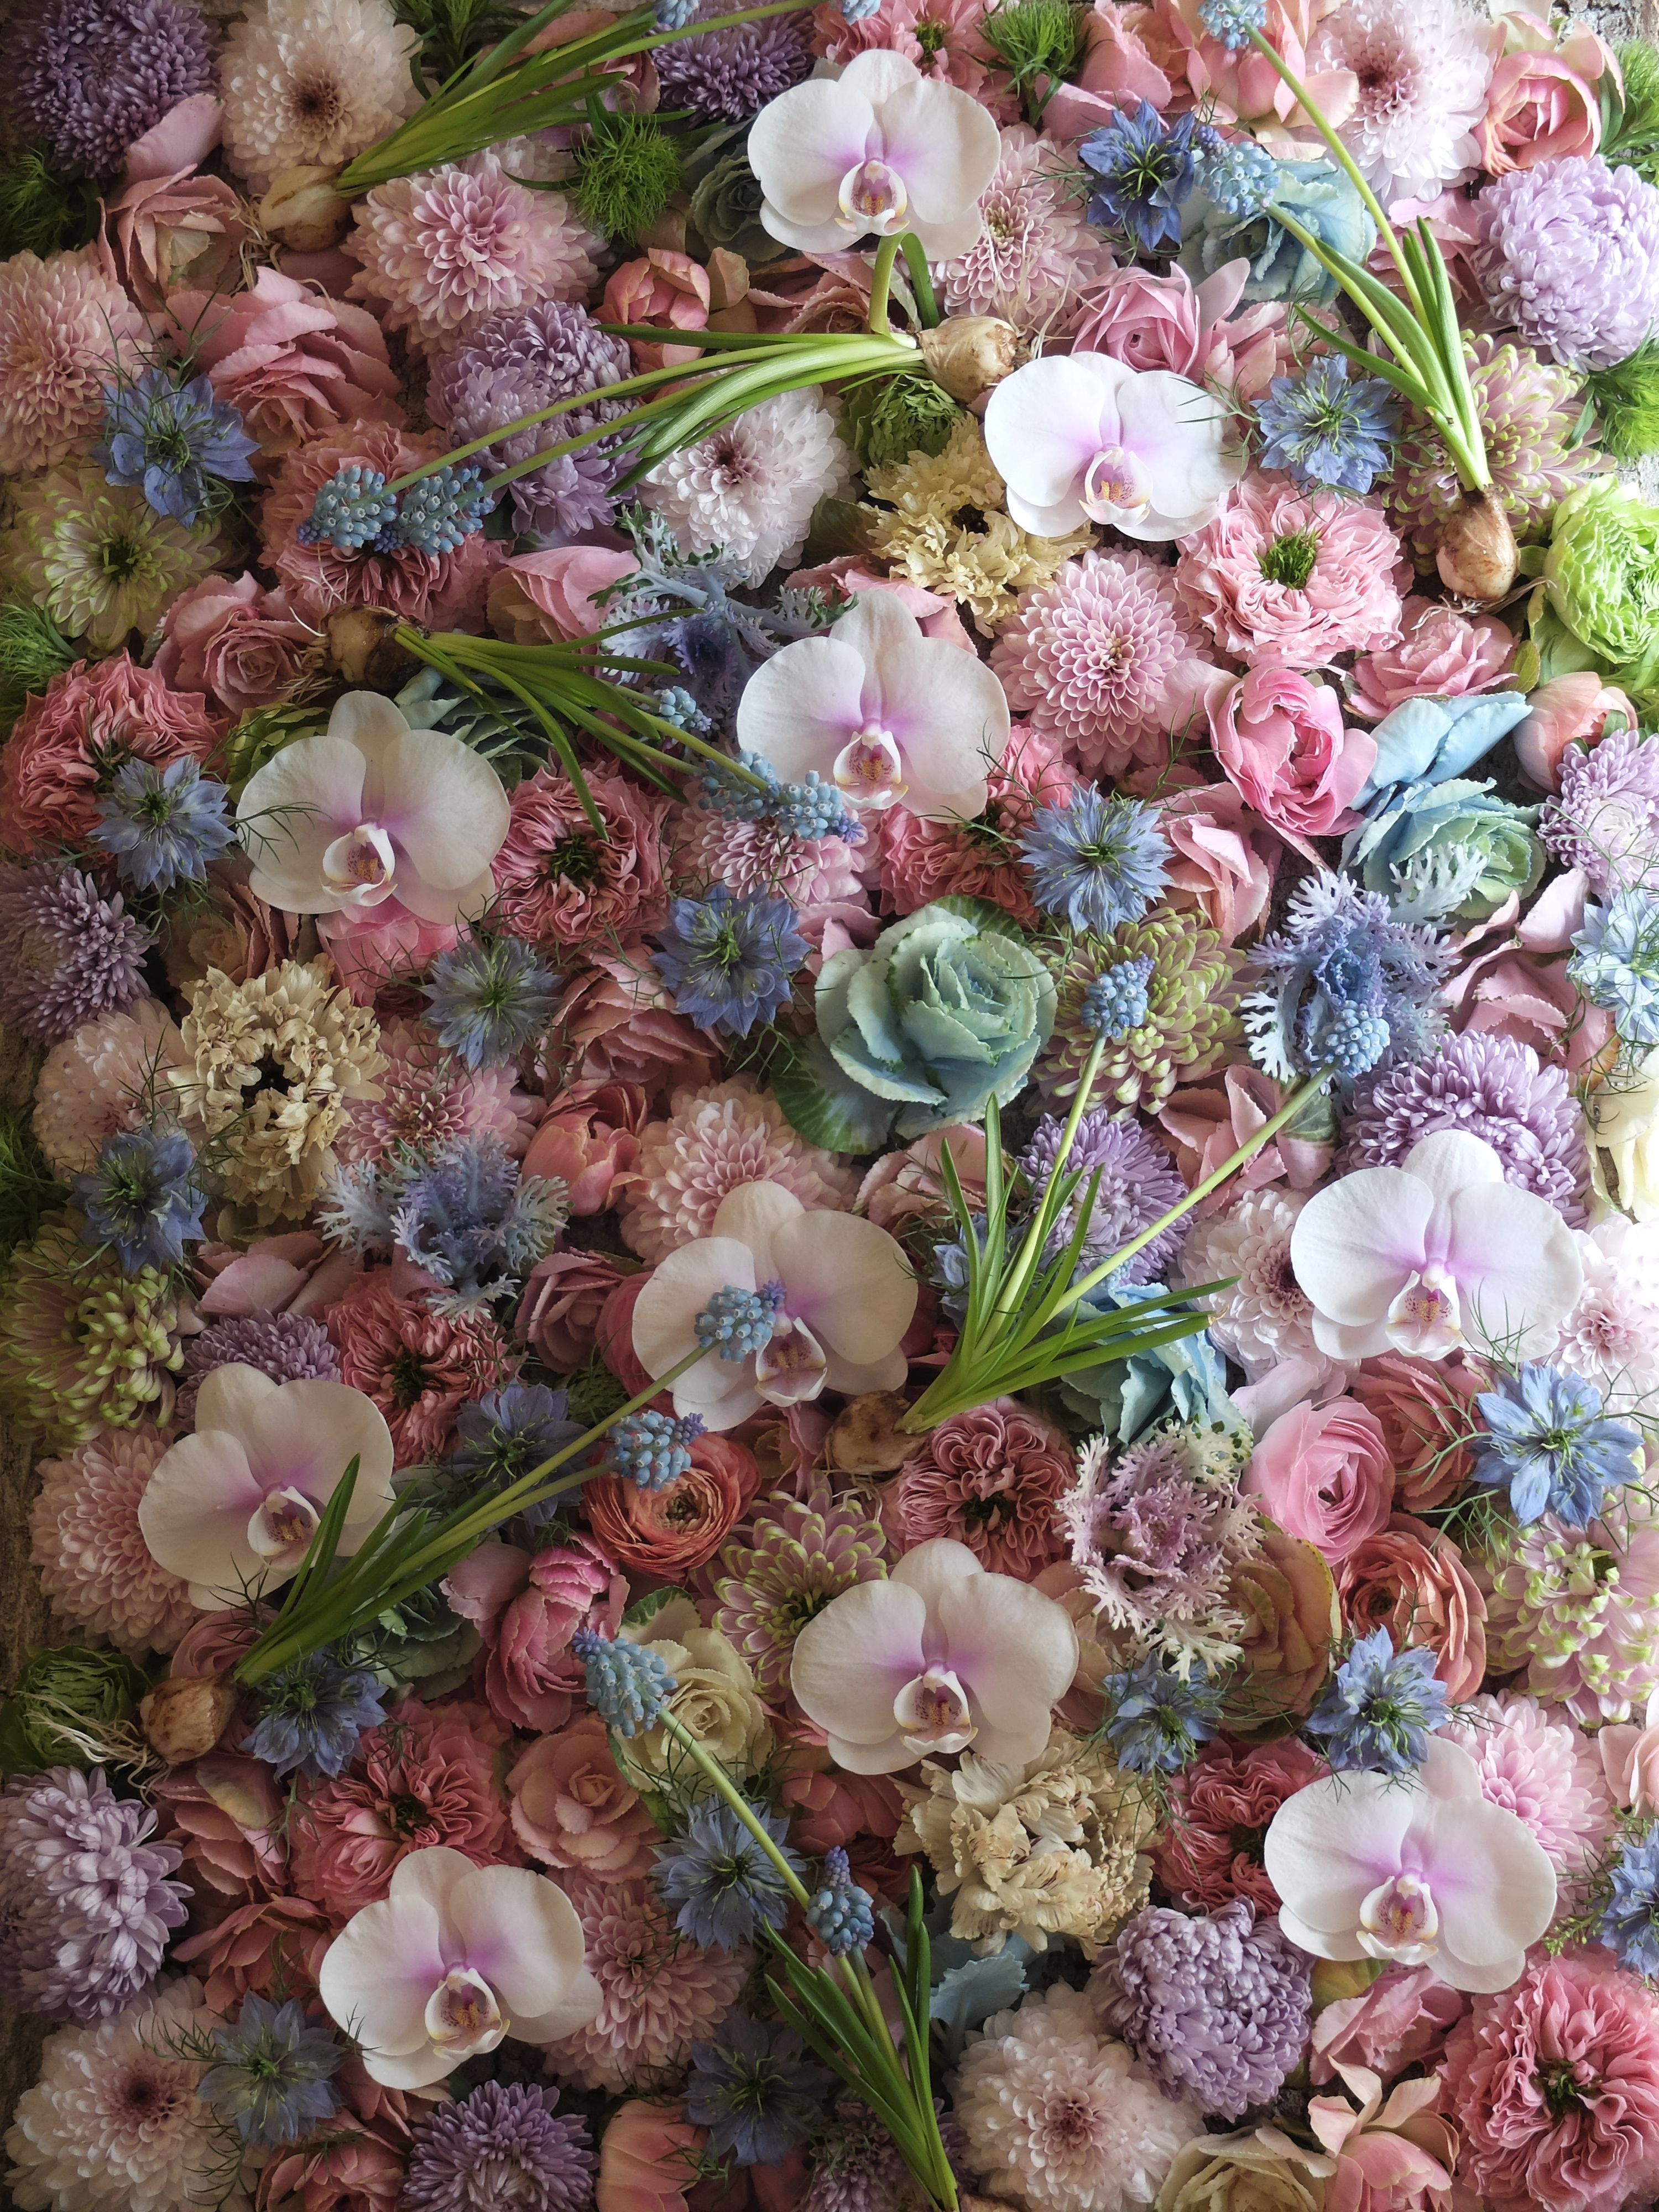 Orchidkaleranunculusasterrosemum And Muscari Weddings